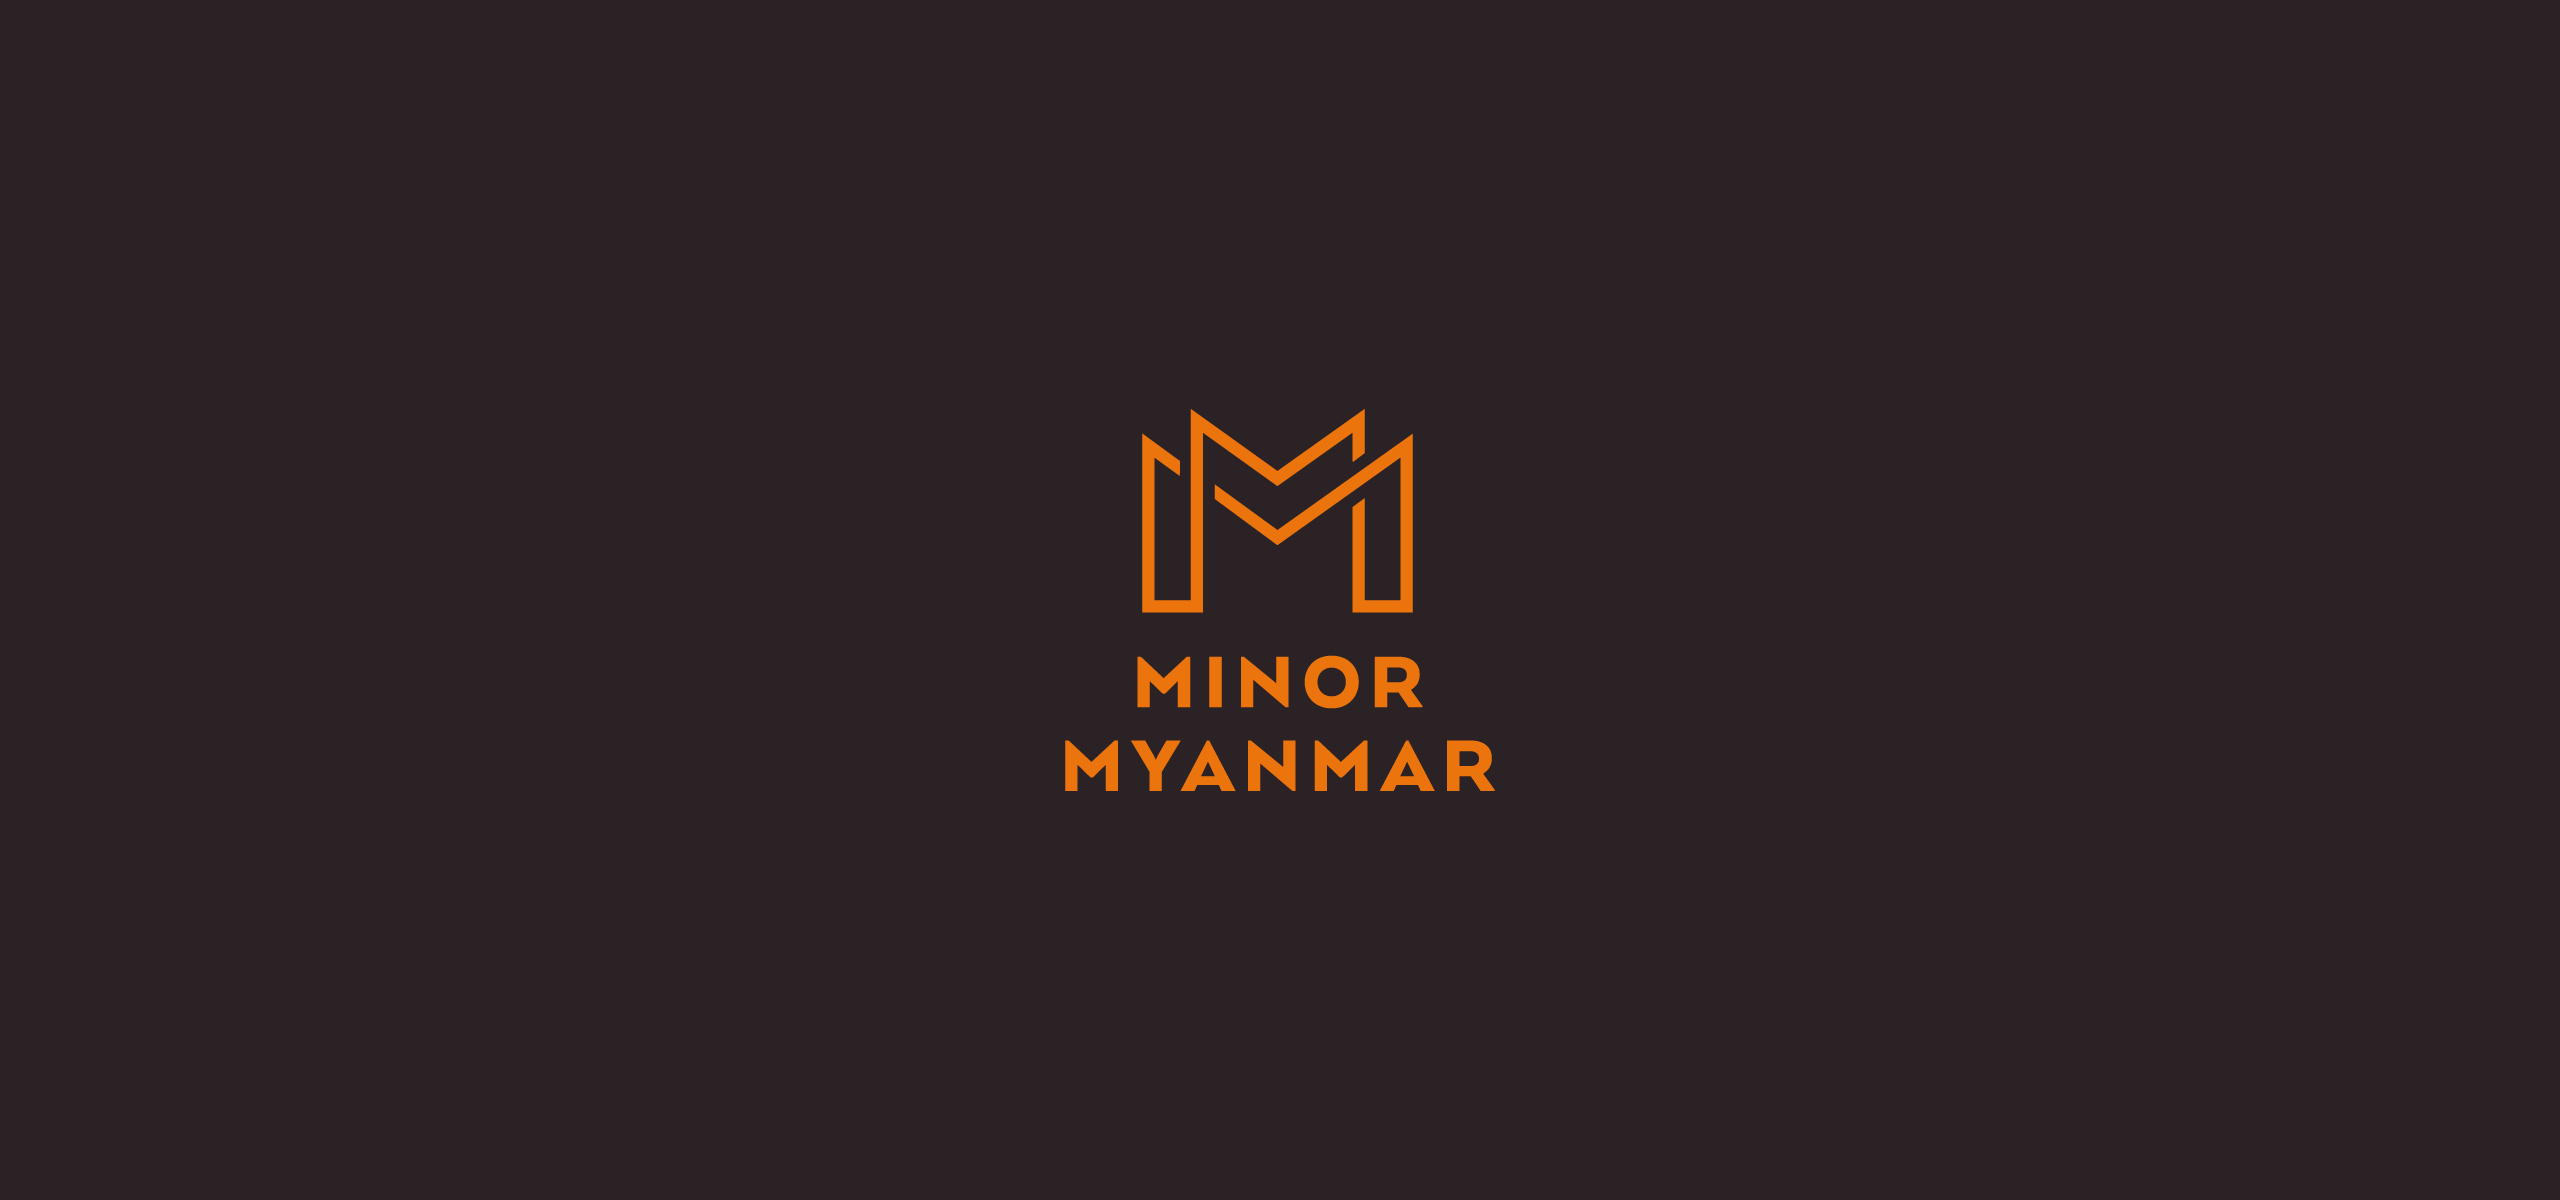 Minor Myanmar Company Limited Brand Identity. Company Logo.